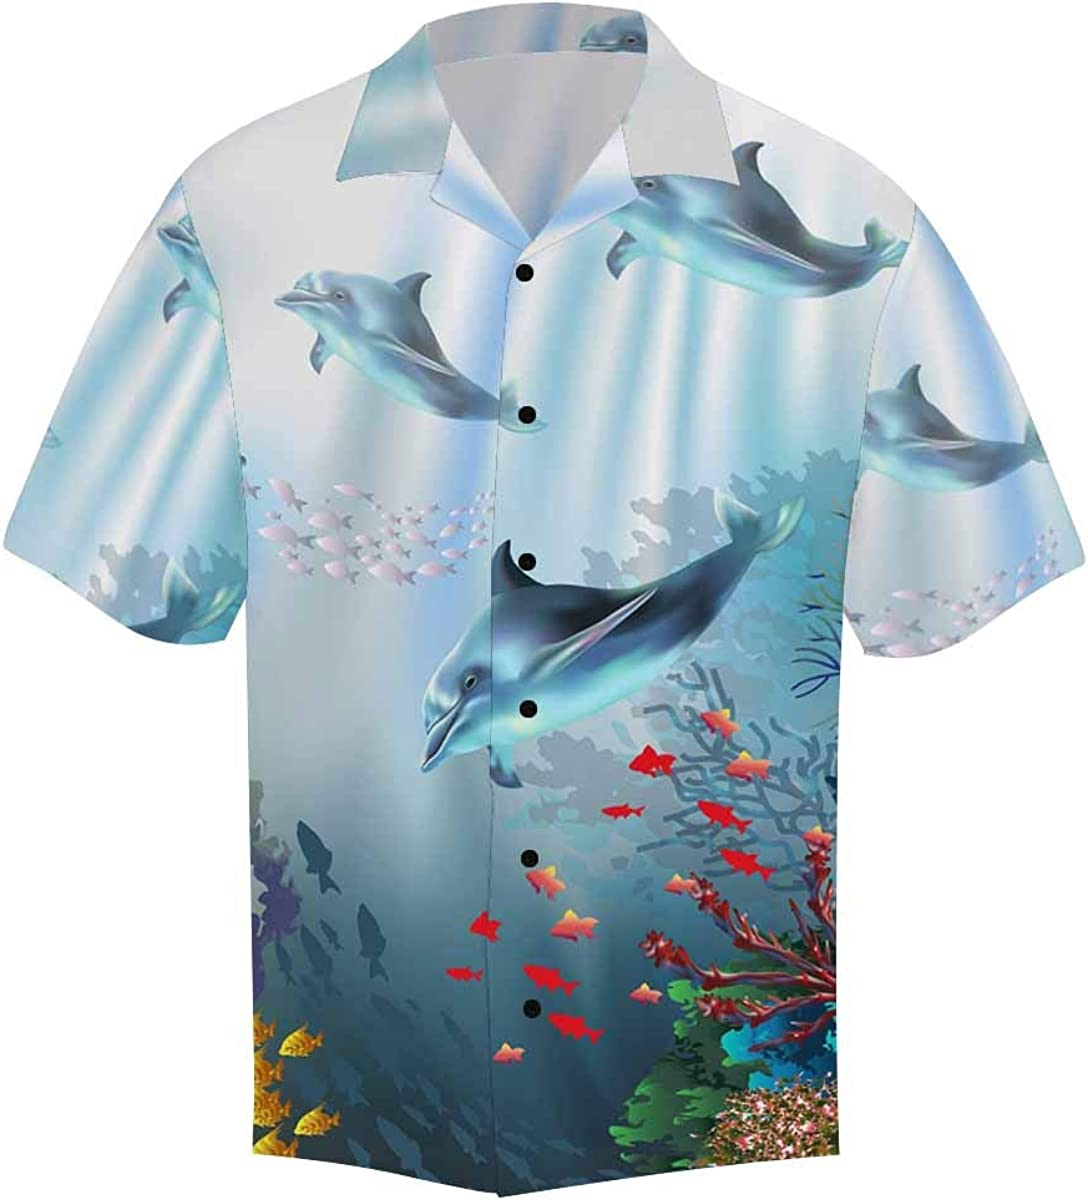 InterestPrint Men's Casual Button Down Short Sleeve Jelly Fish Watercolor Hawaiian Shirt (S-5XL)